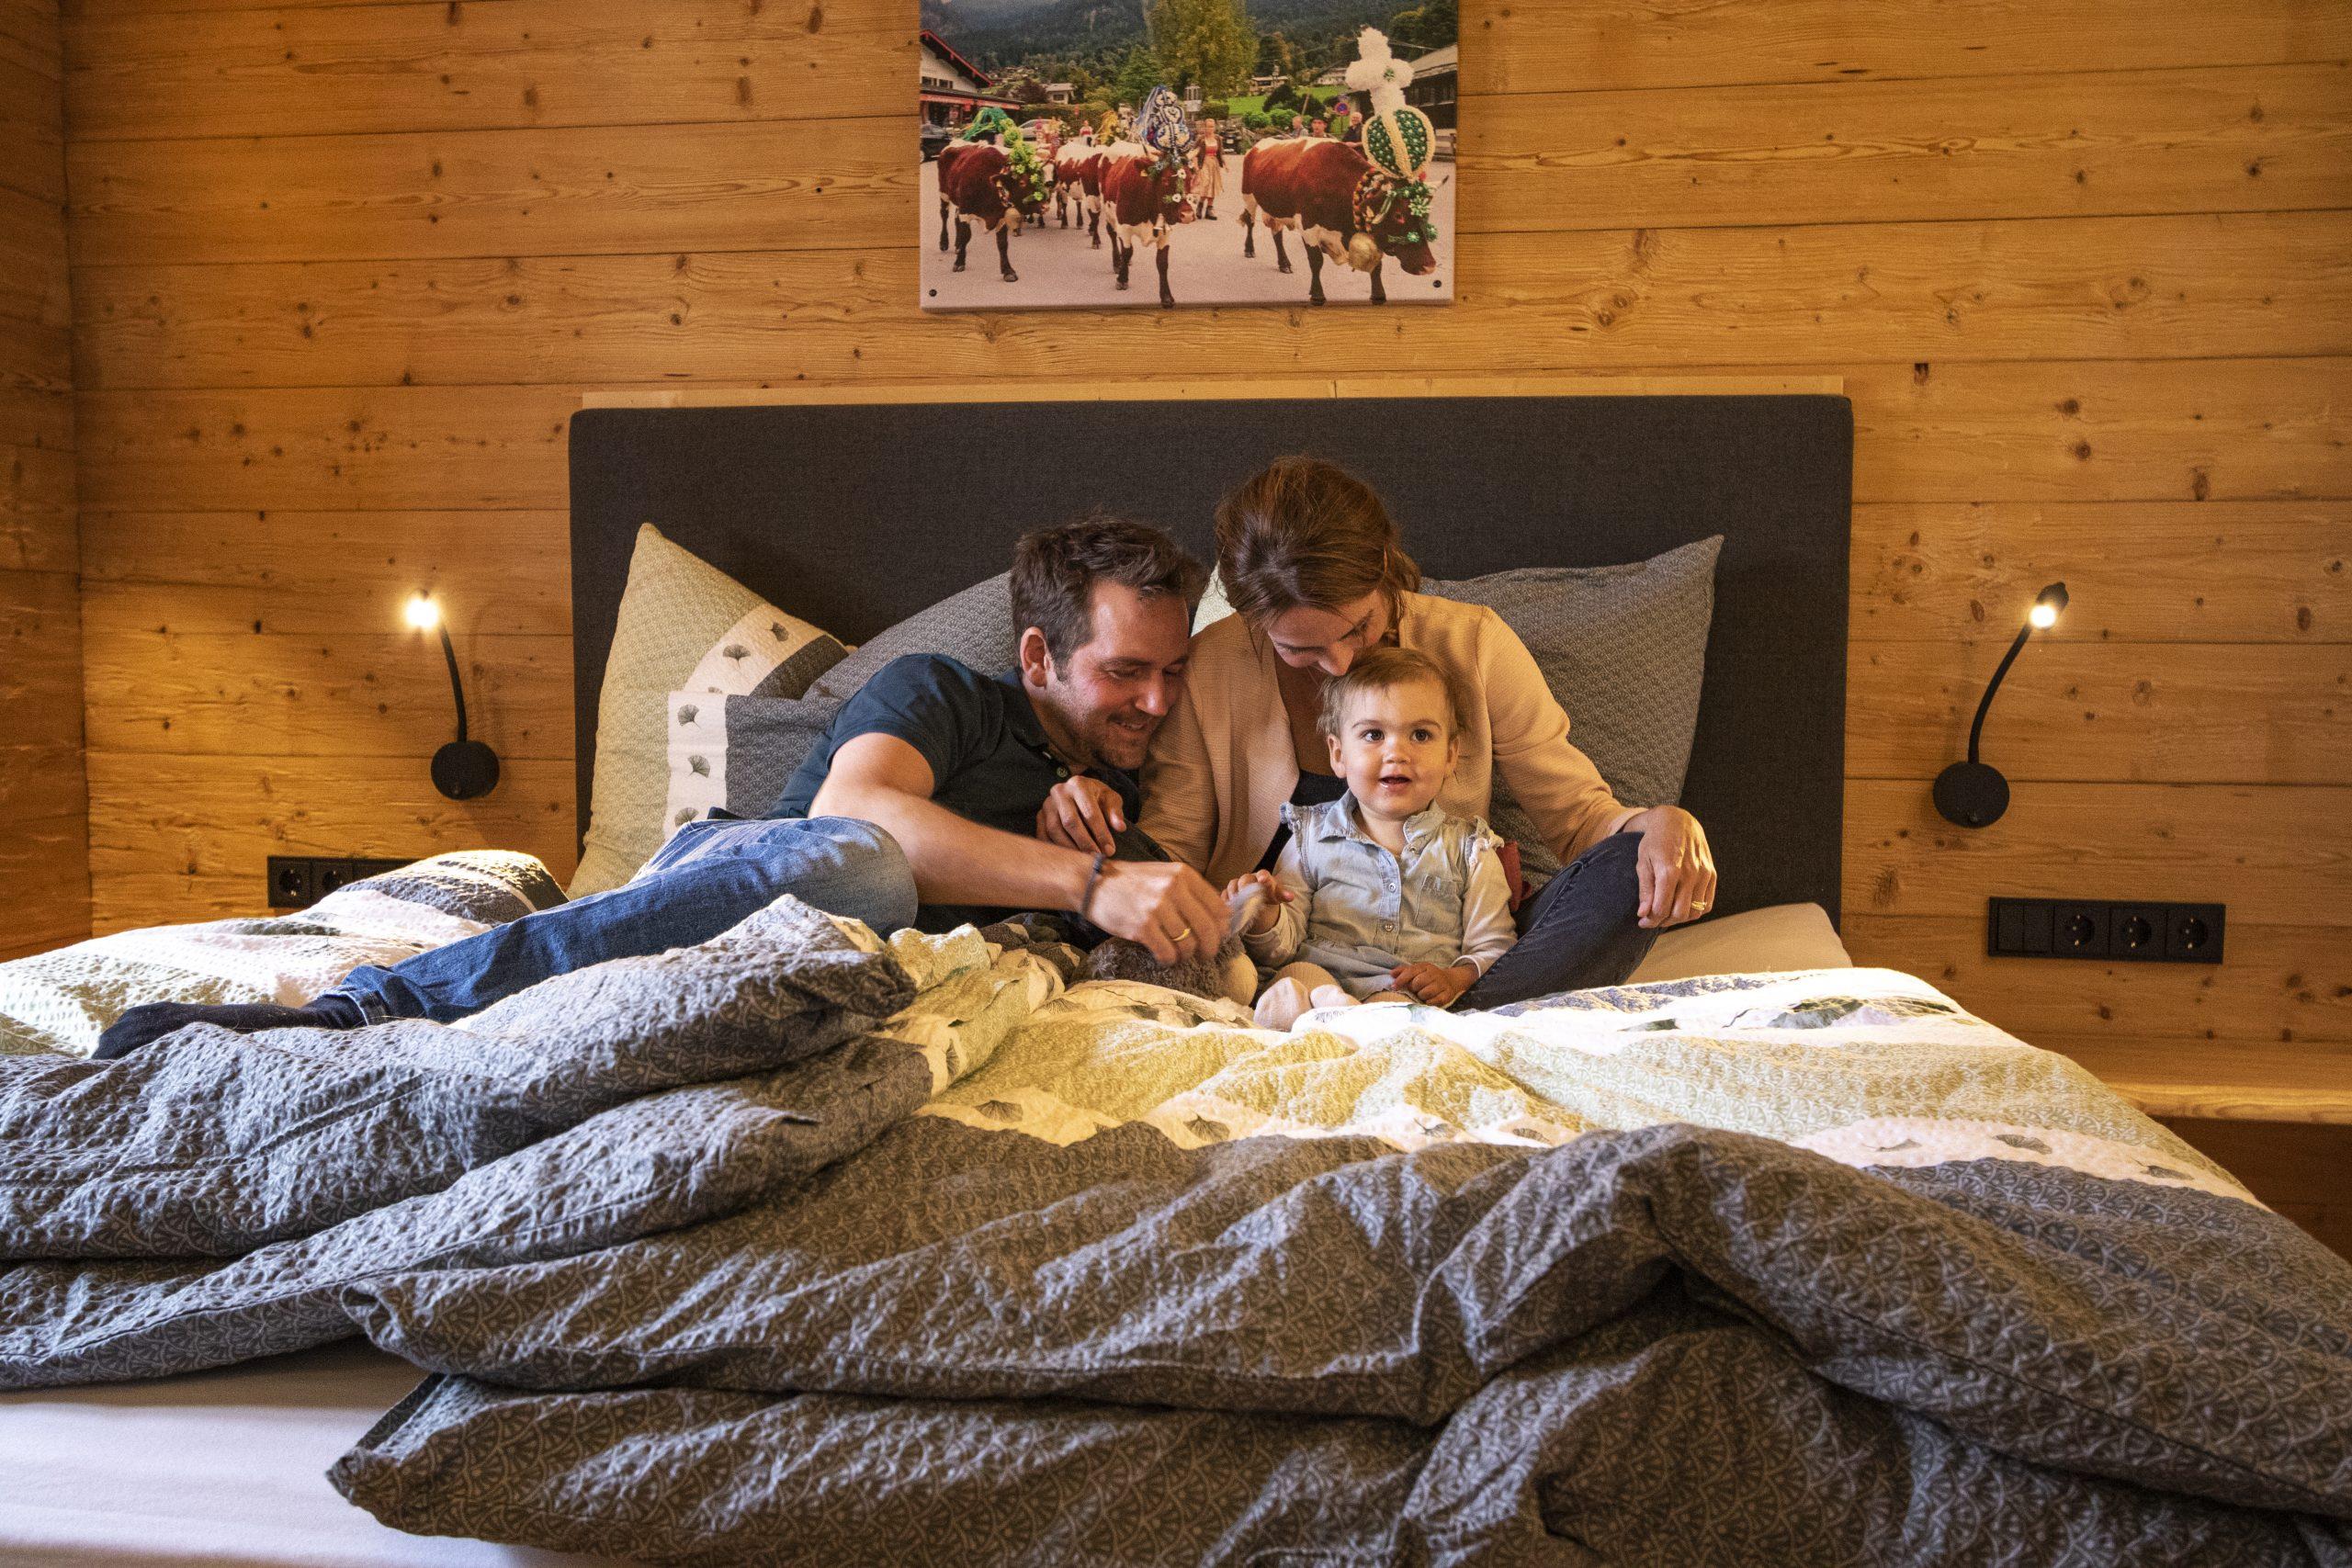 Familienbild im Bett